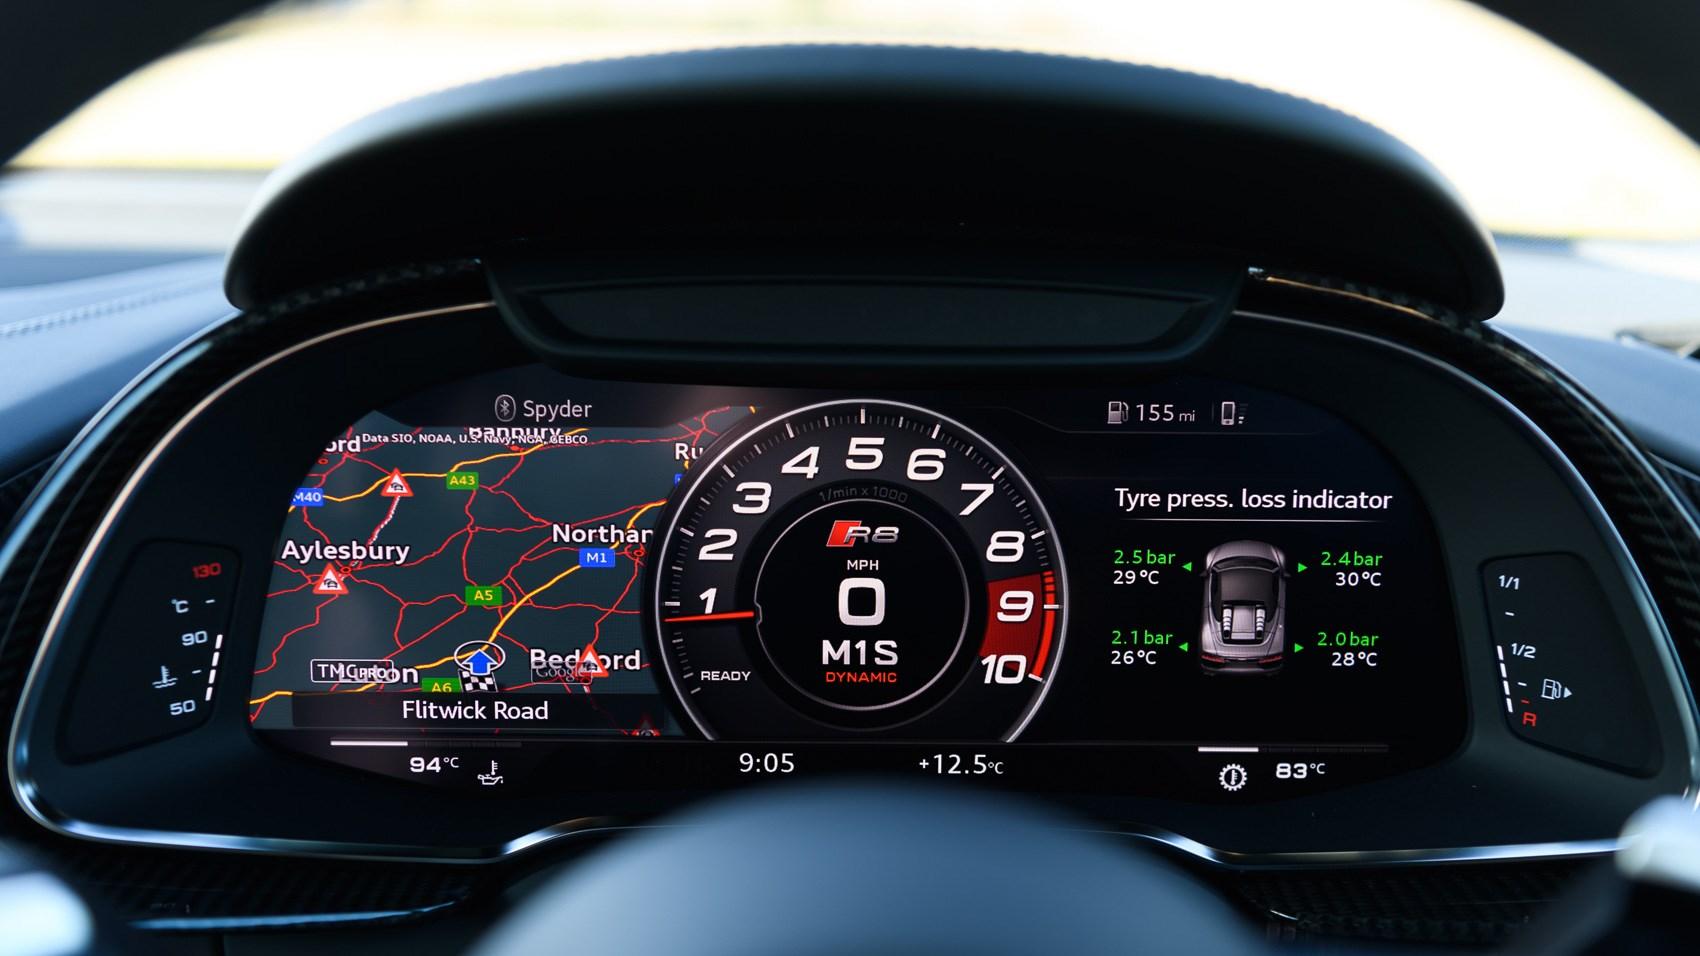 Audi r8 v10 spyder 52 fsi quattro r tronic